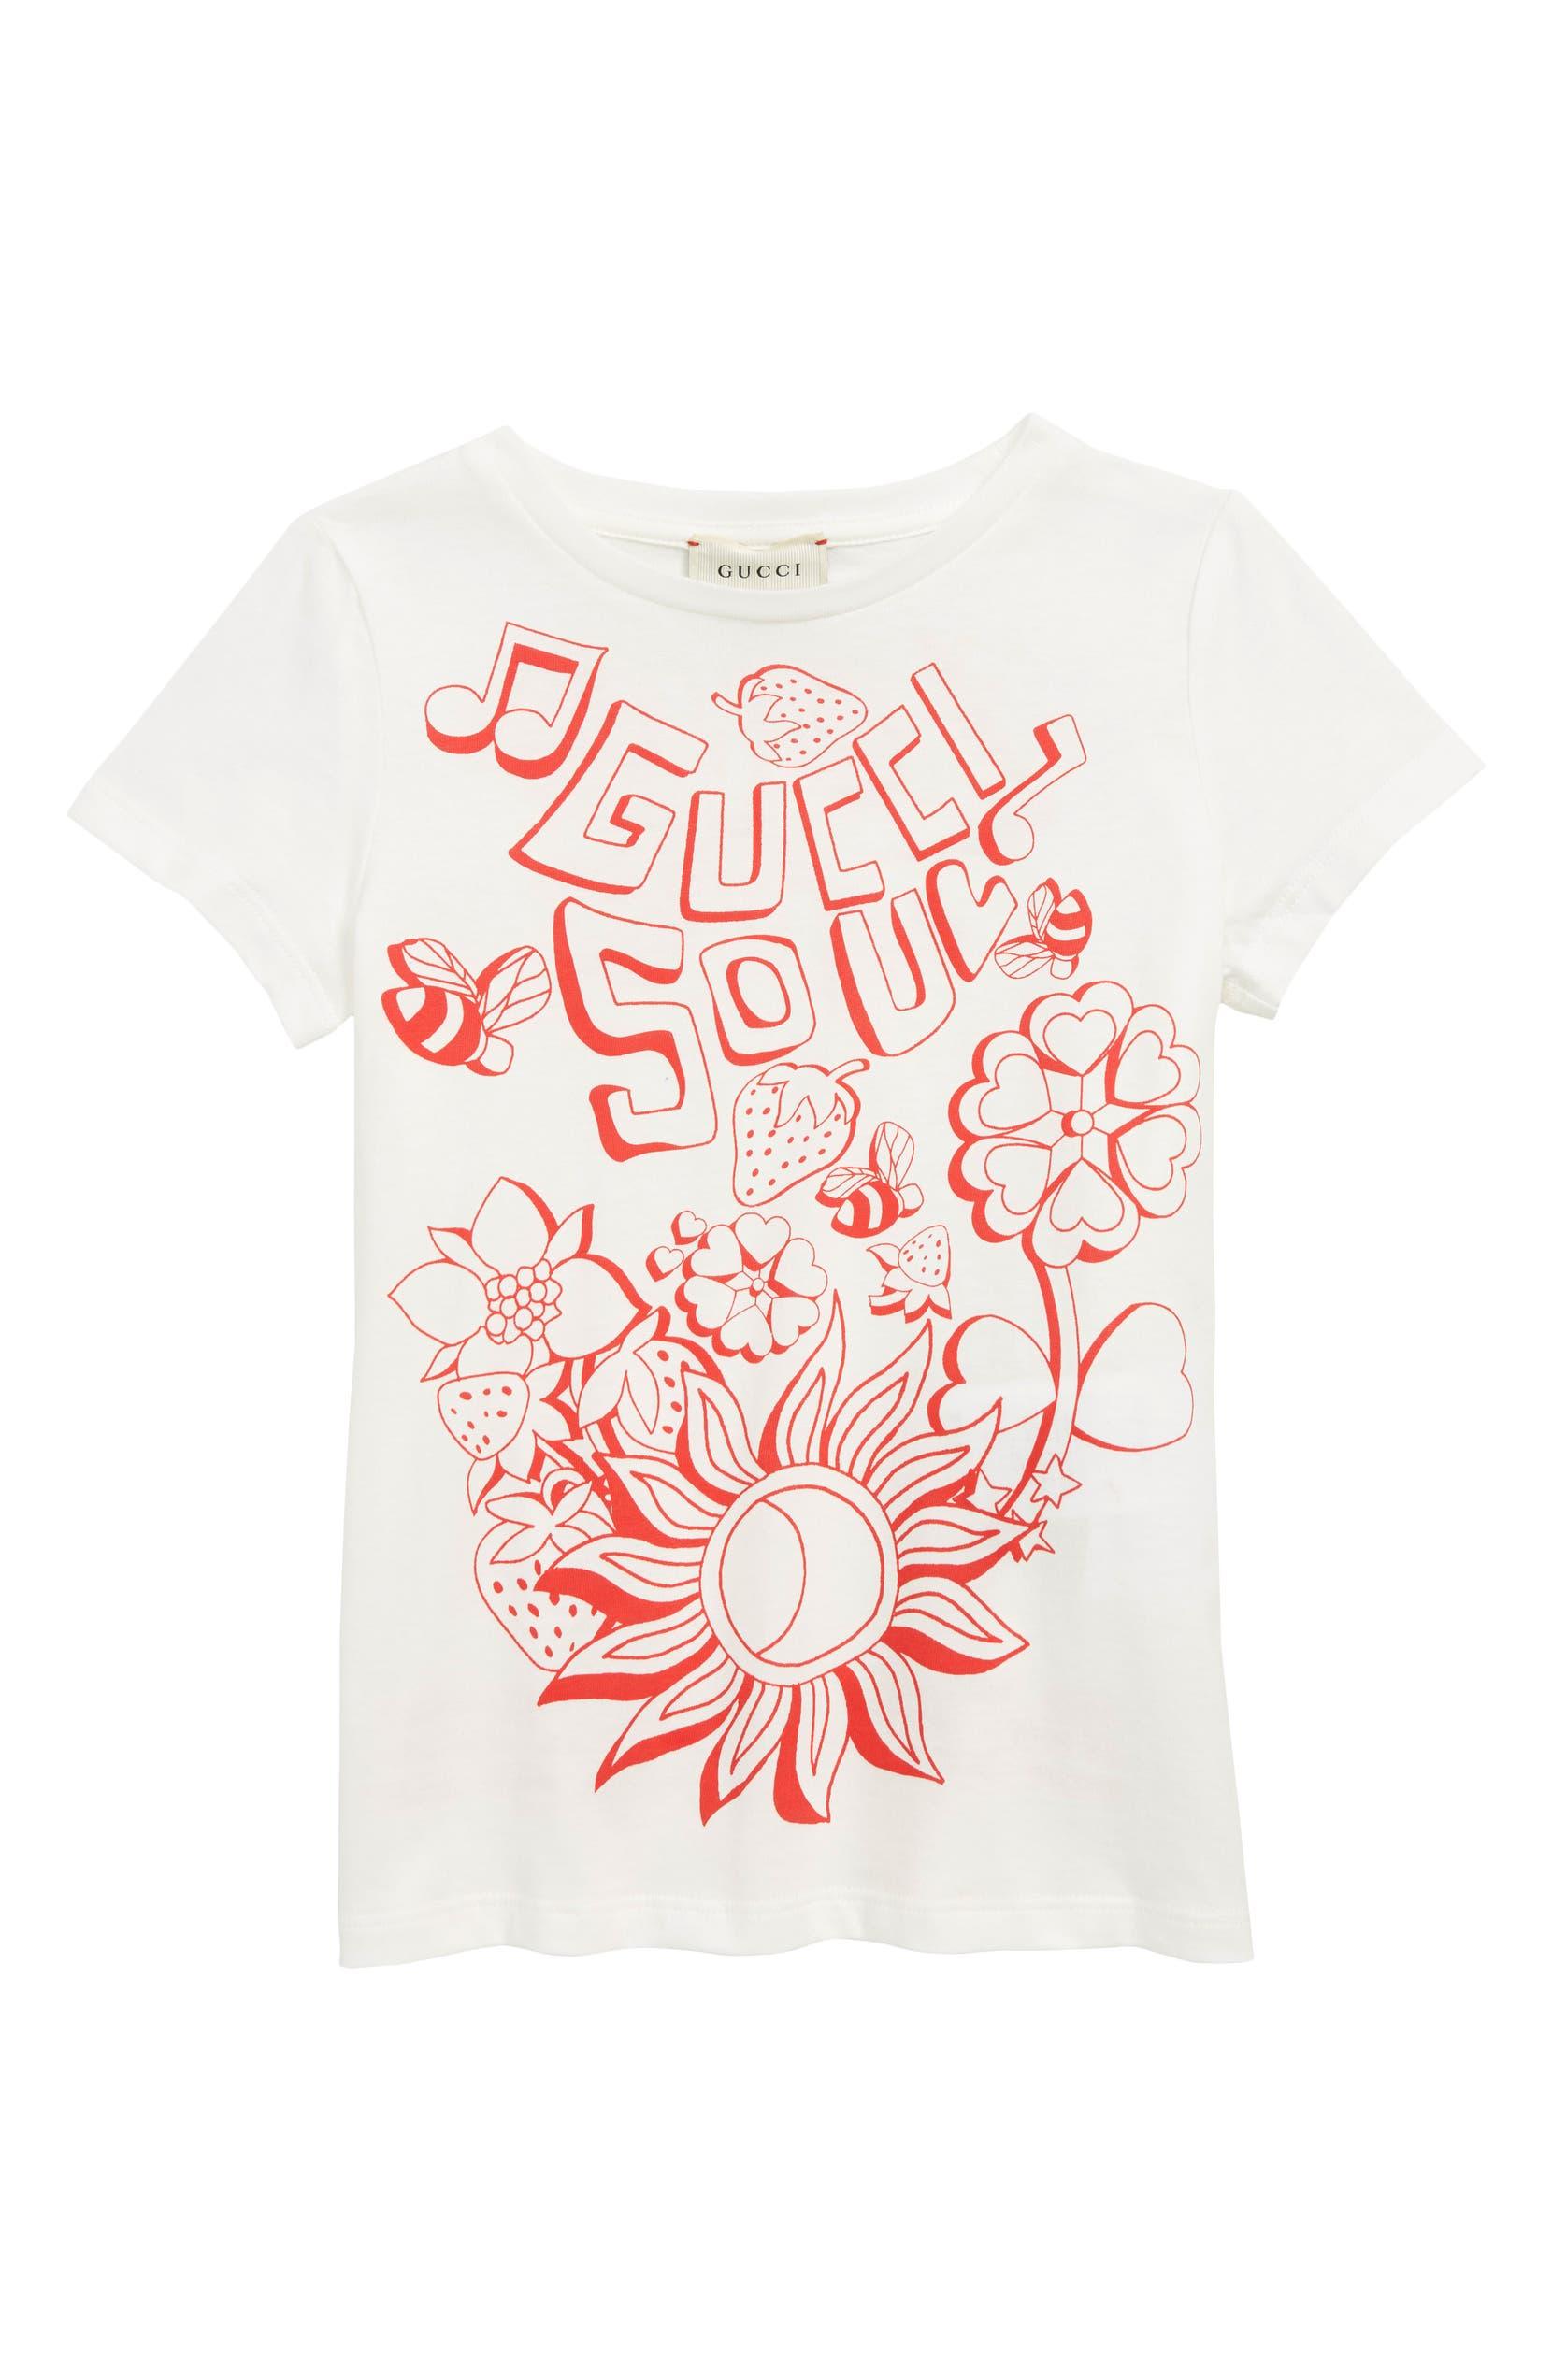 0c0e92c9207 Gucci Graphic Tee (Little Girls   Big Girls)